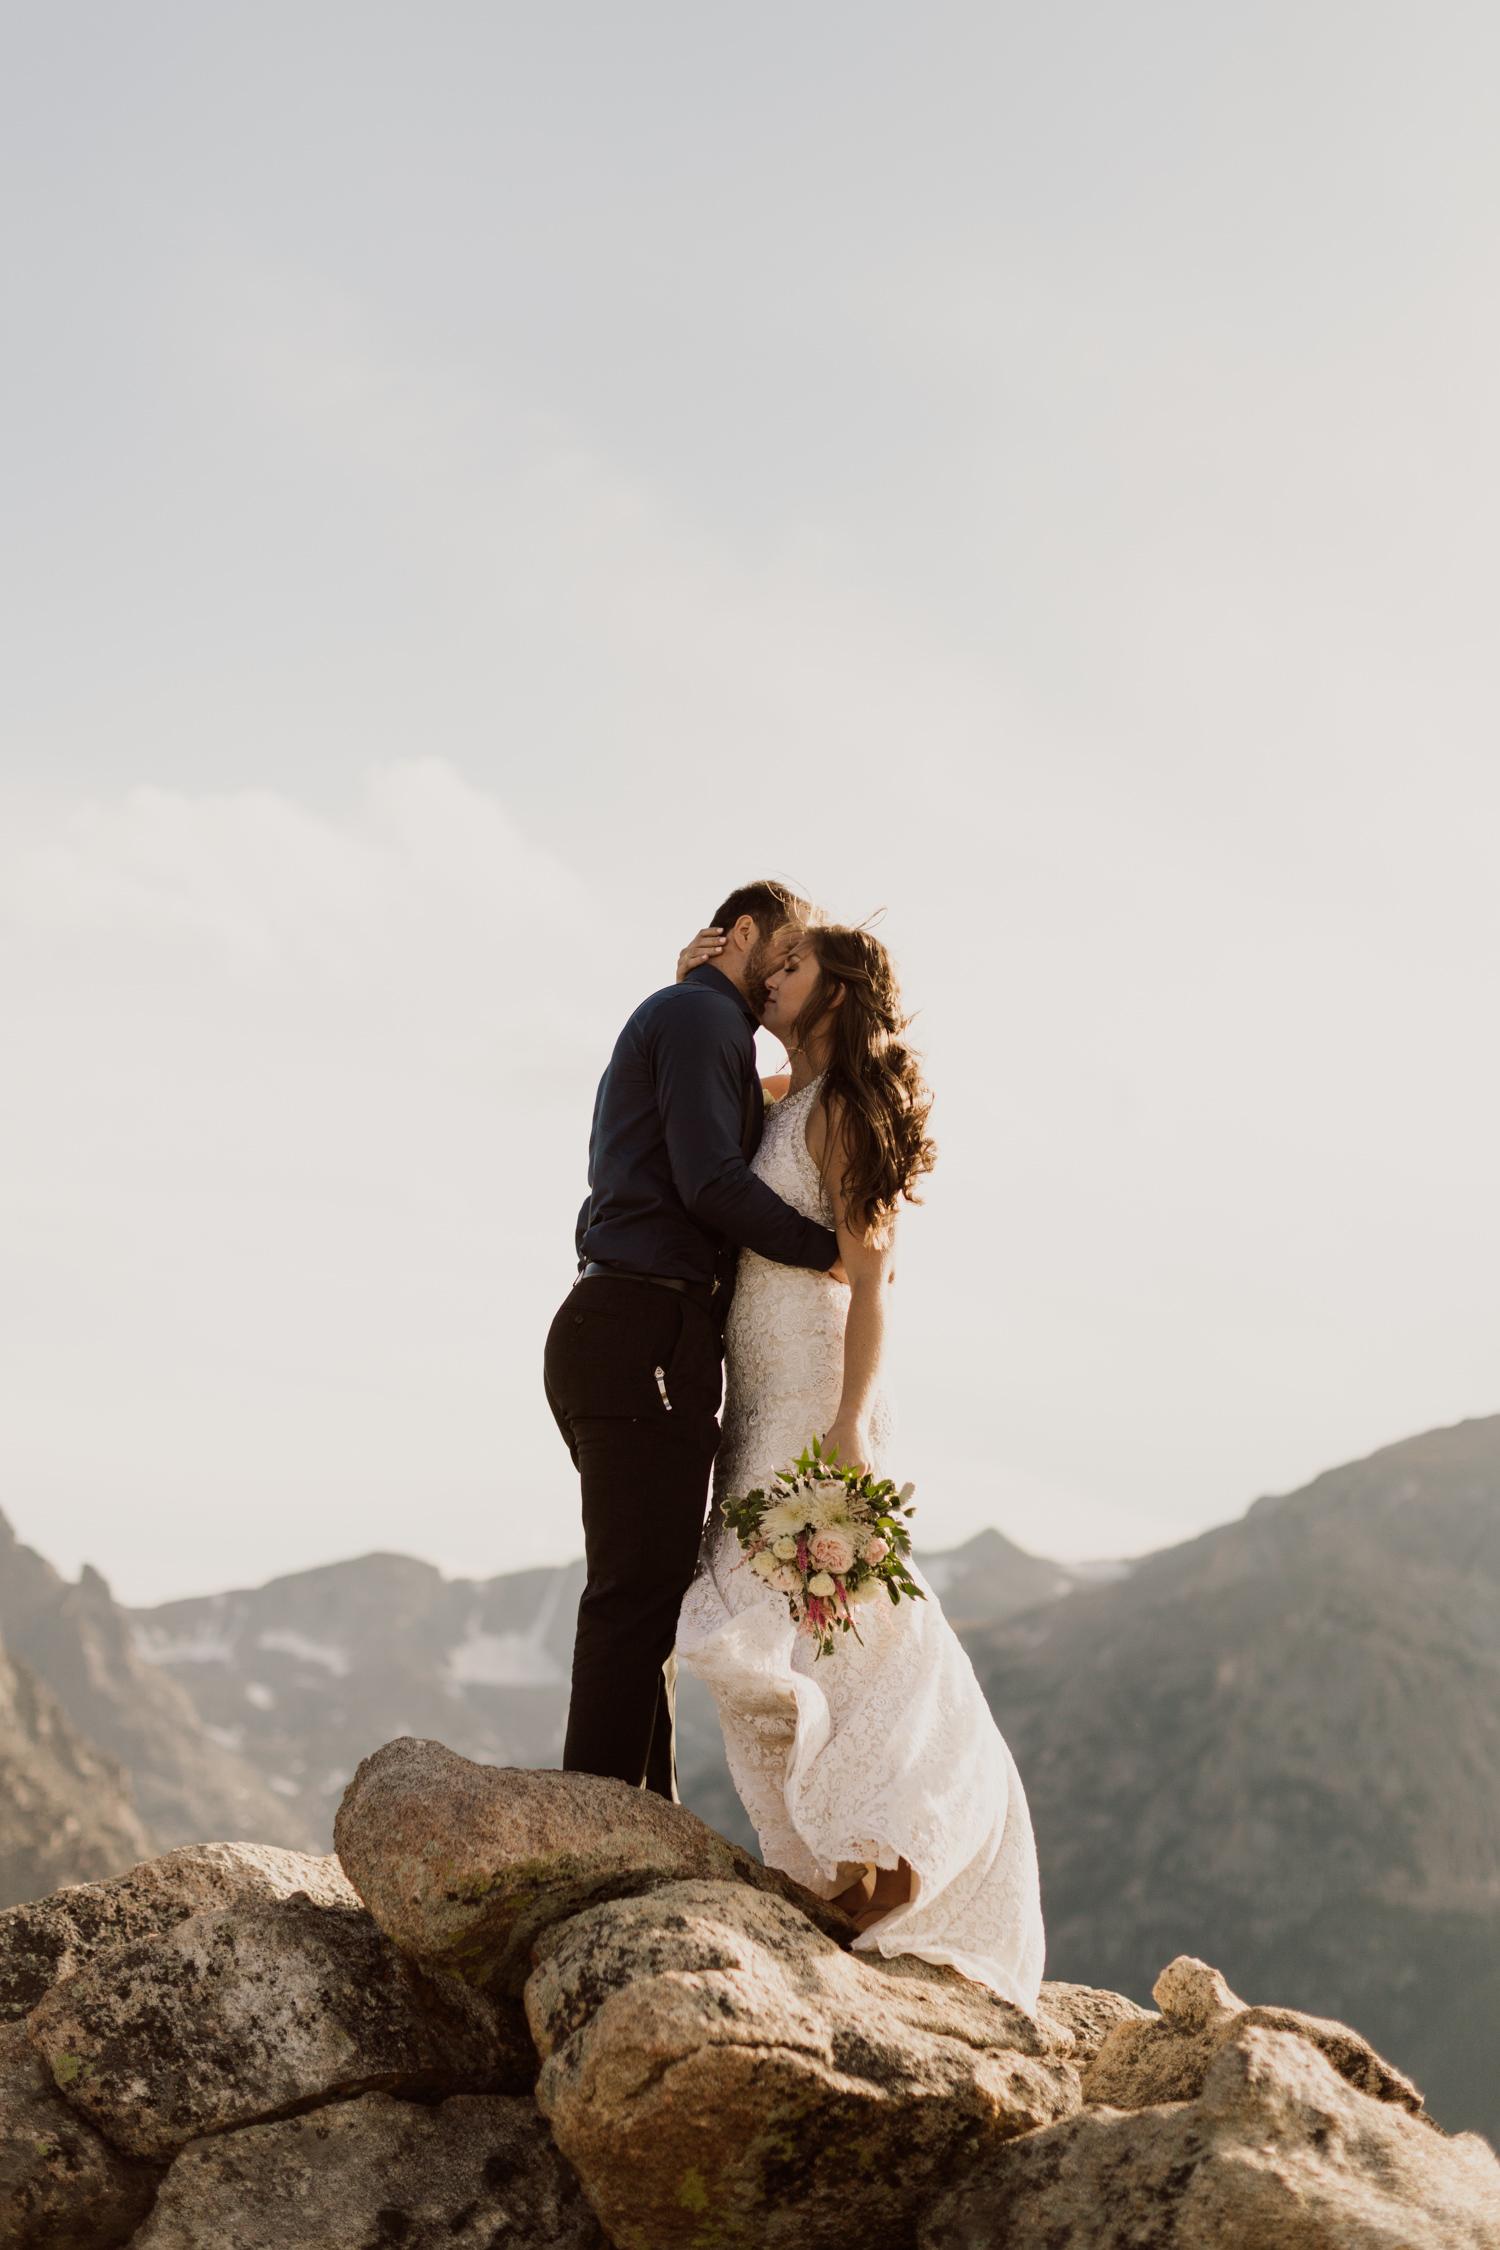 rocky-mountain-national-park-wedding-34.jpg